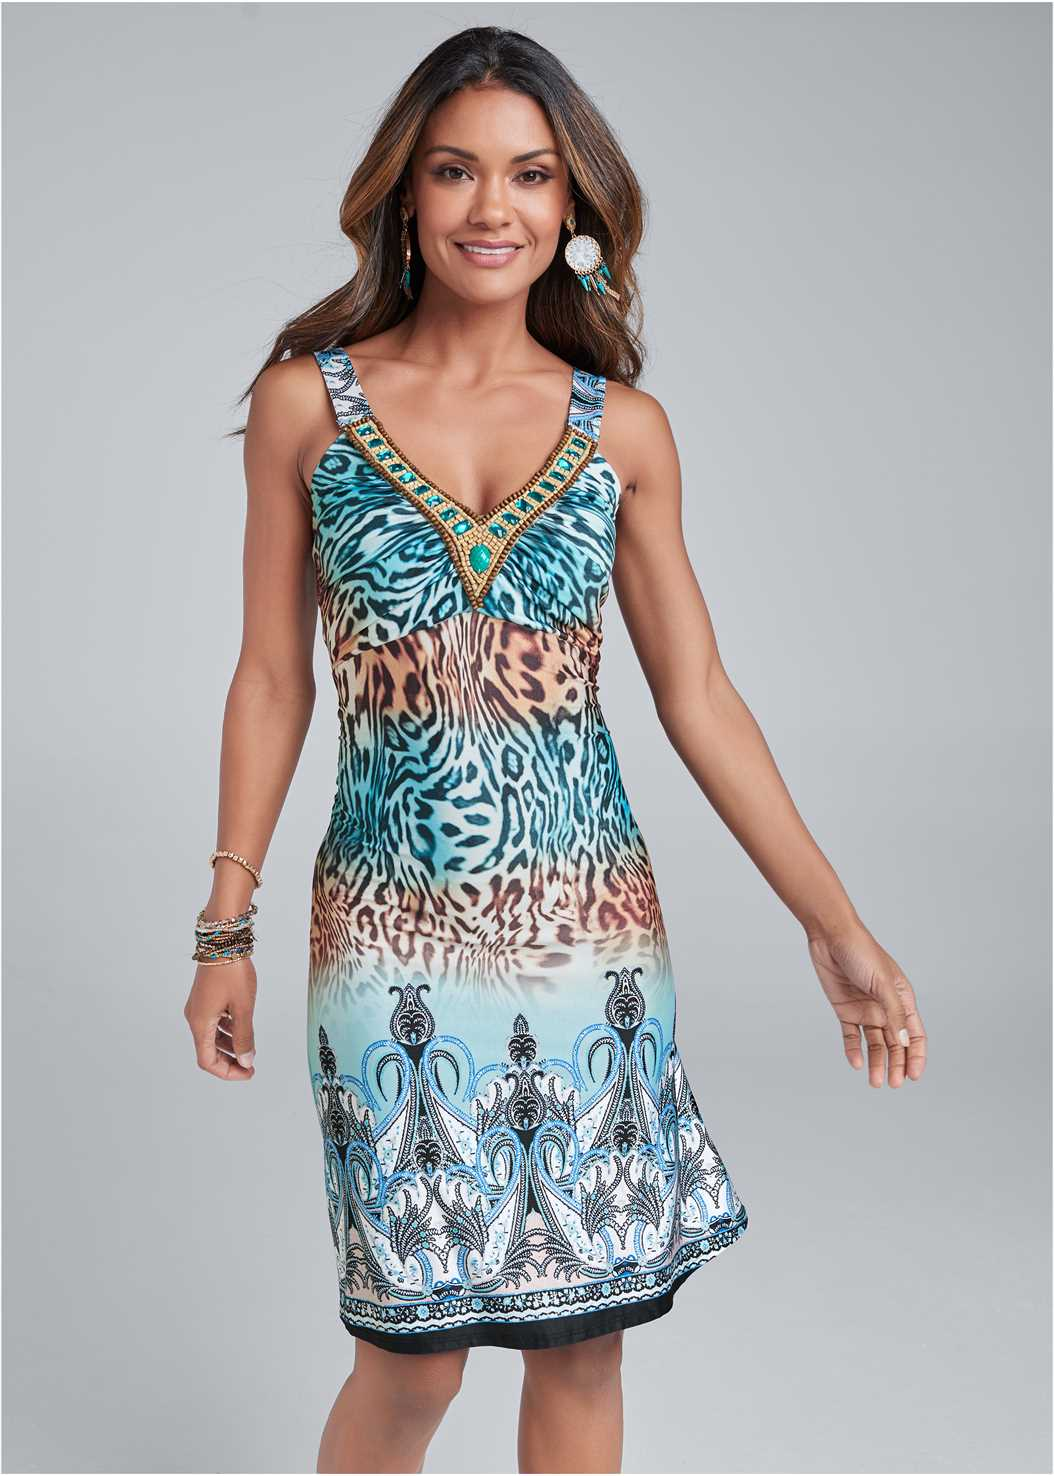 Embellished Animal Print Mini Dress